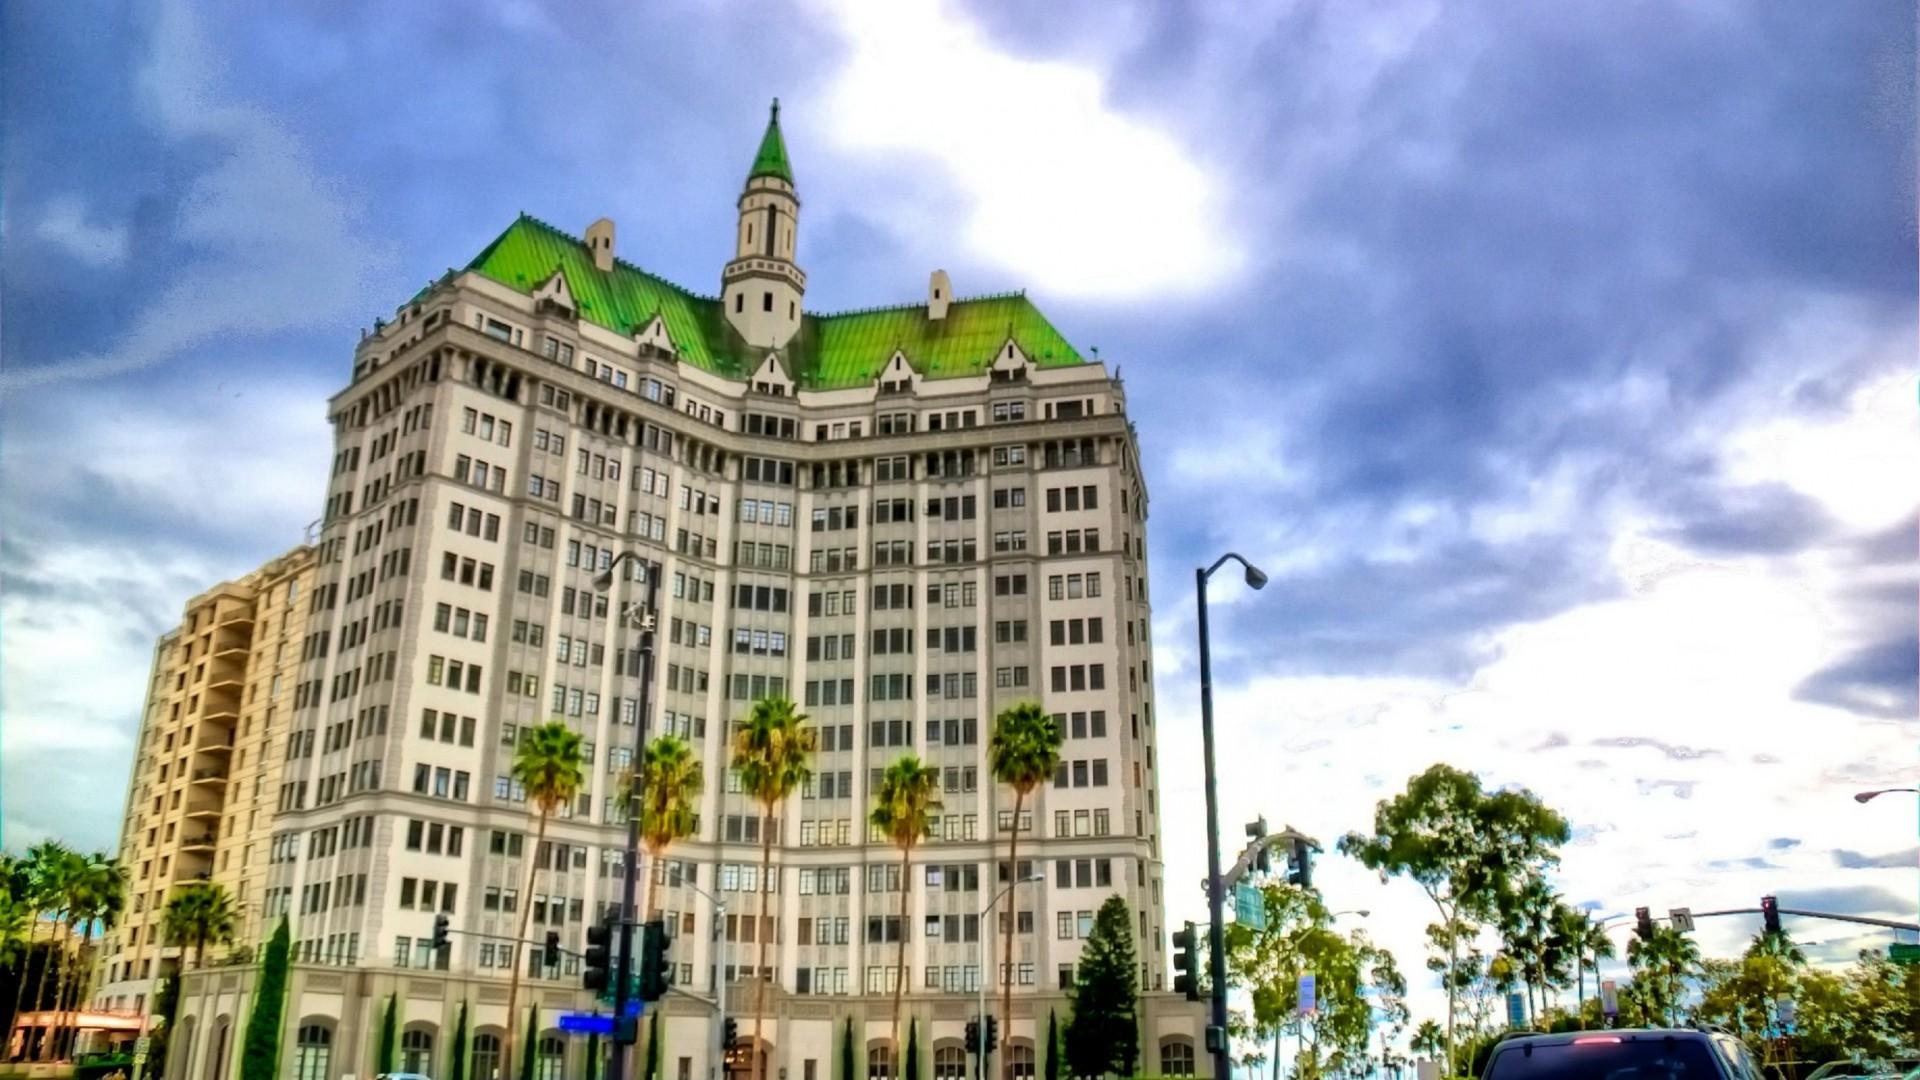 The Long Beach Building